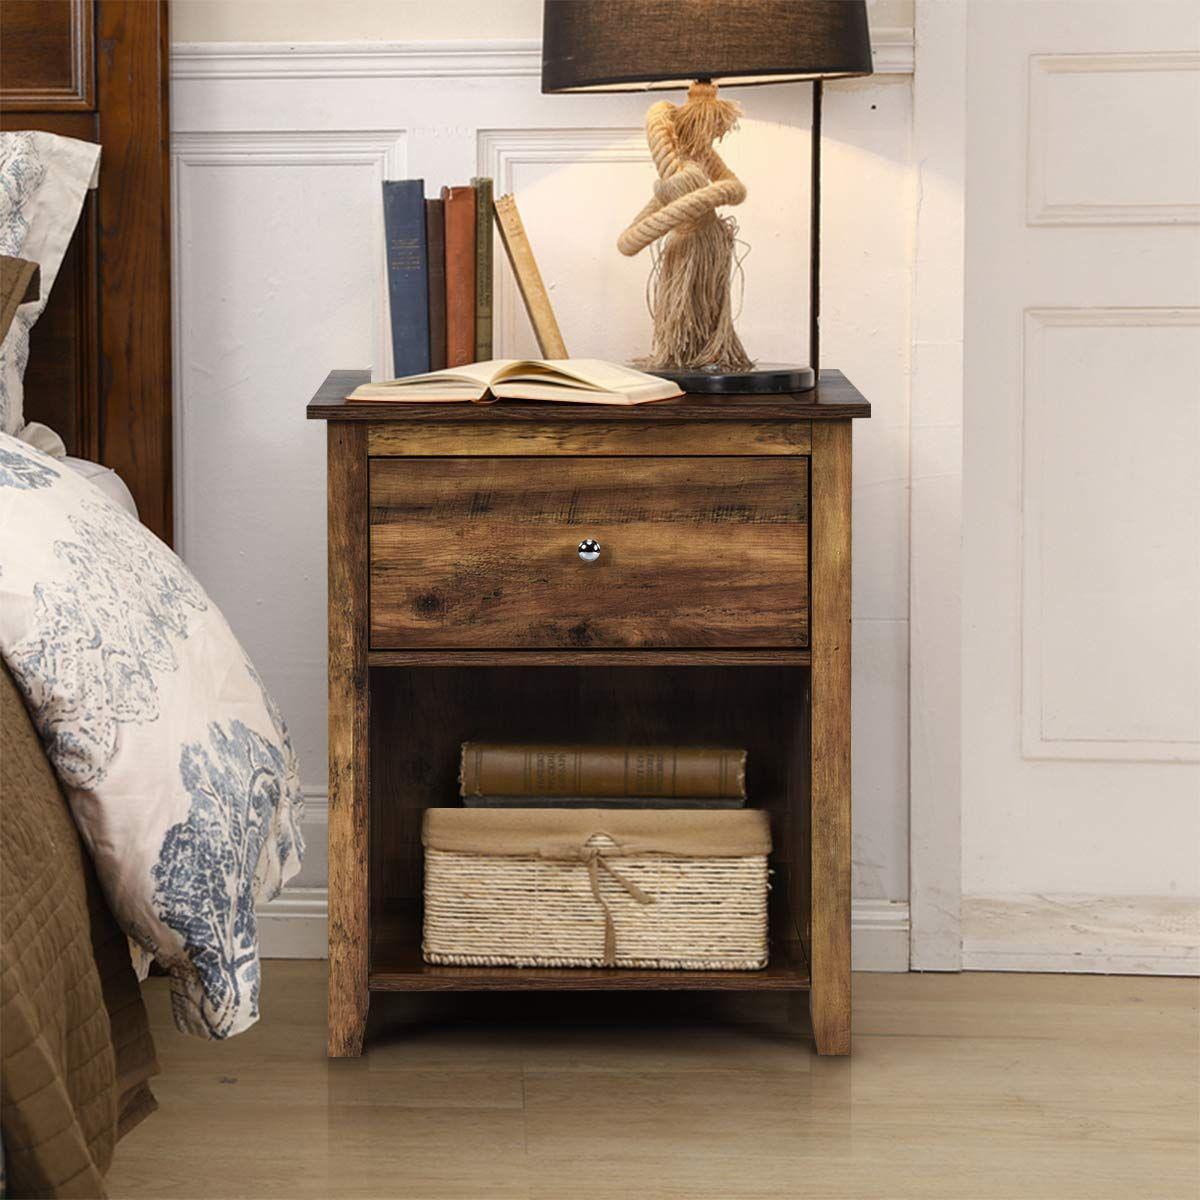 Coastal Nightstands Beach Nightstands In 2020 Coastal Bedroom Furniture Beach Bedroom Furniture Coffee Table With Storage